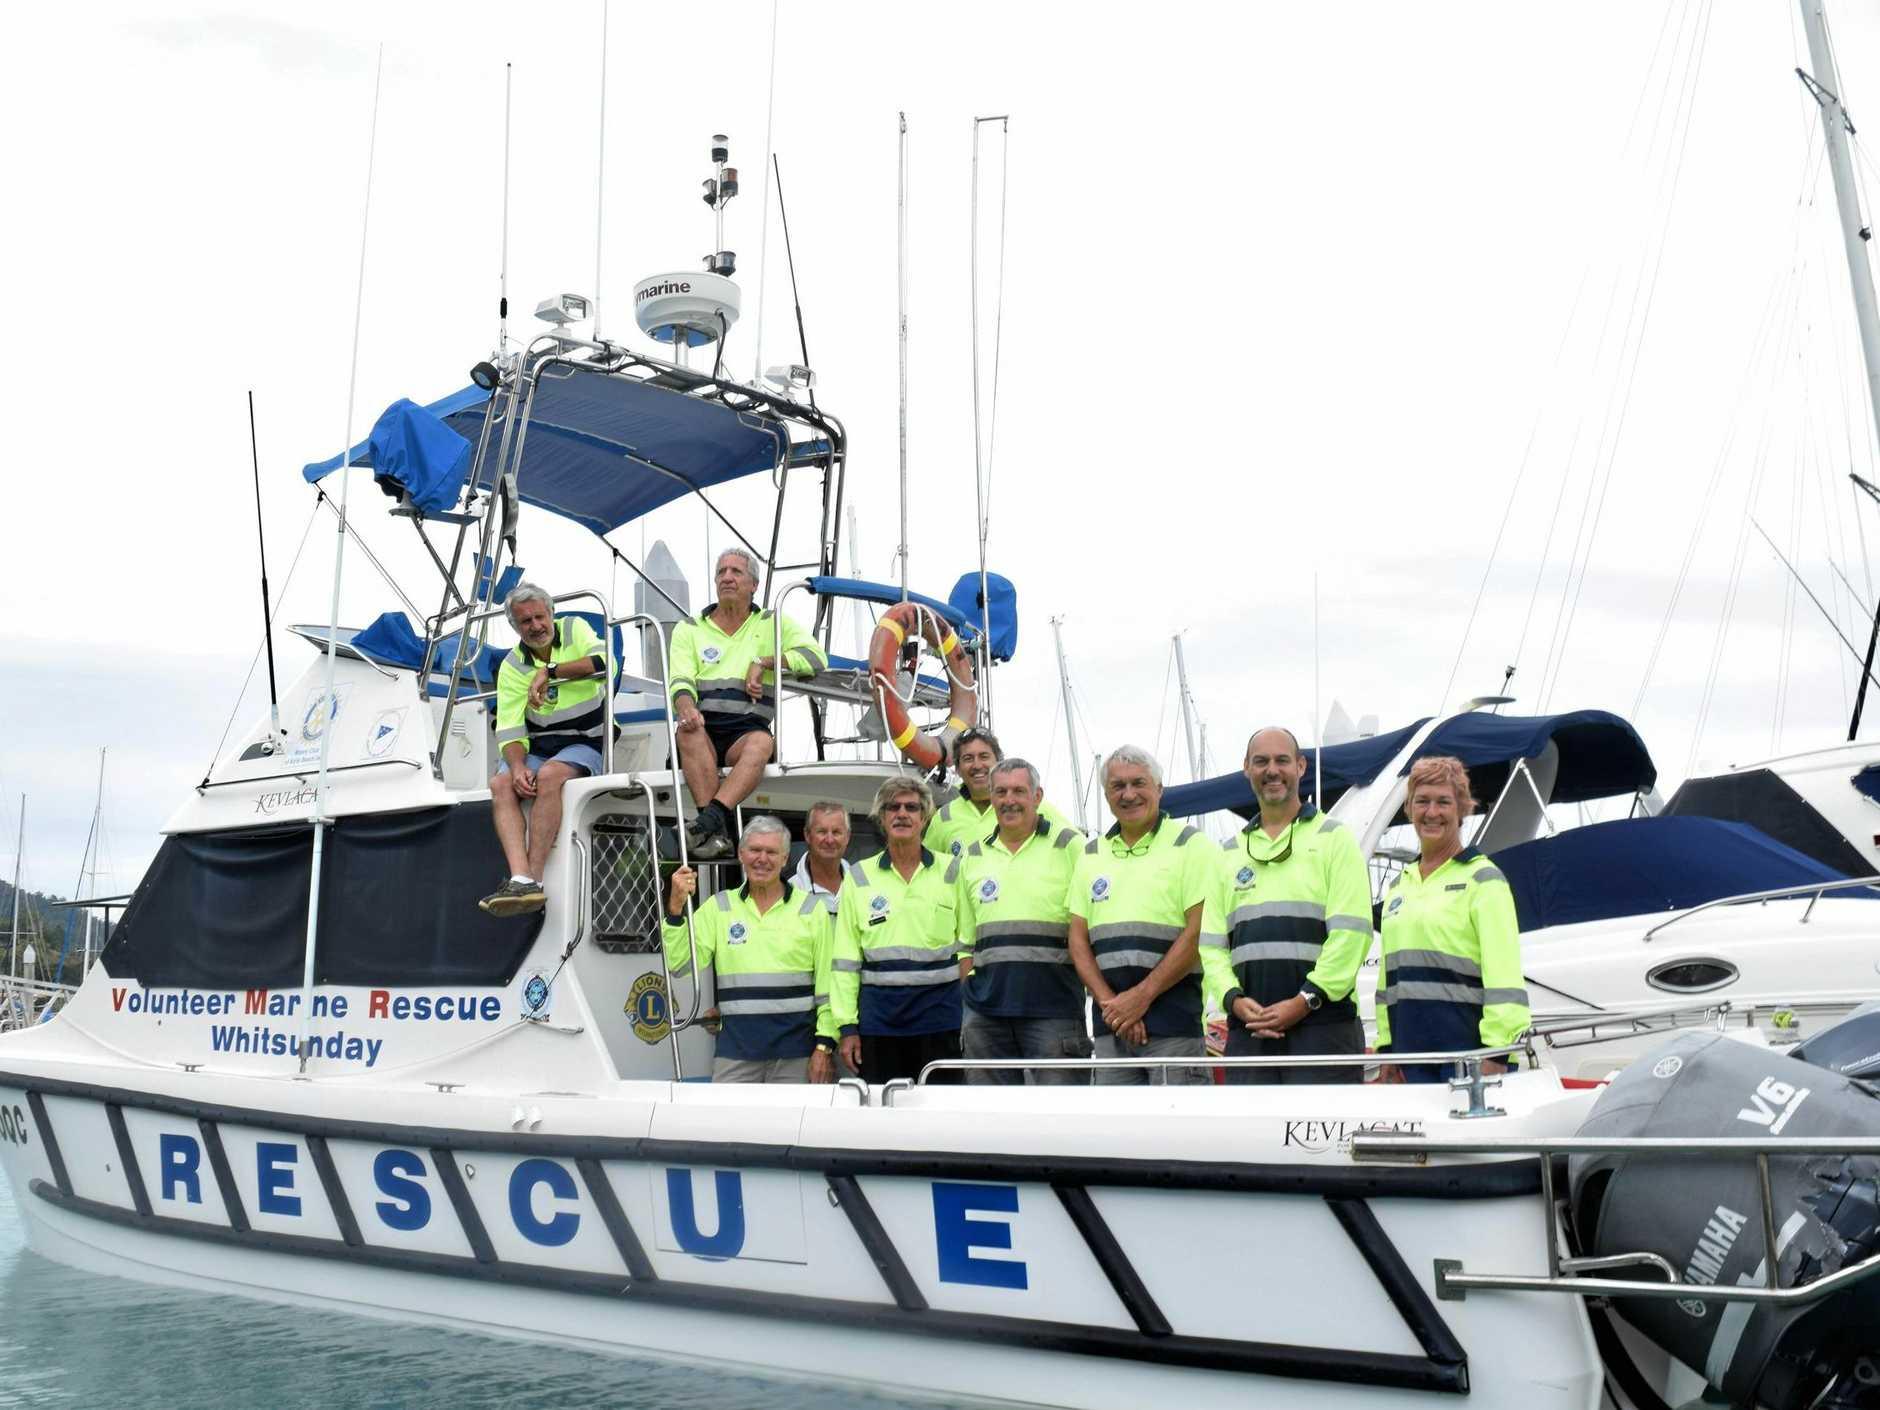 VMR Whitsunday volunteer crew members Geoff Smith, Fin Forbes, Roger Wodson, David Burge, Ronnie Roberts, Mark Wright, Rod Wilson, Norbert Gross, Stu Applegate and Gay Bowden on VMR1.